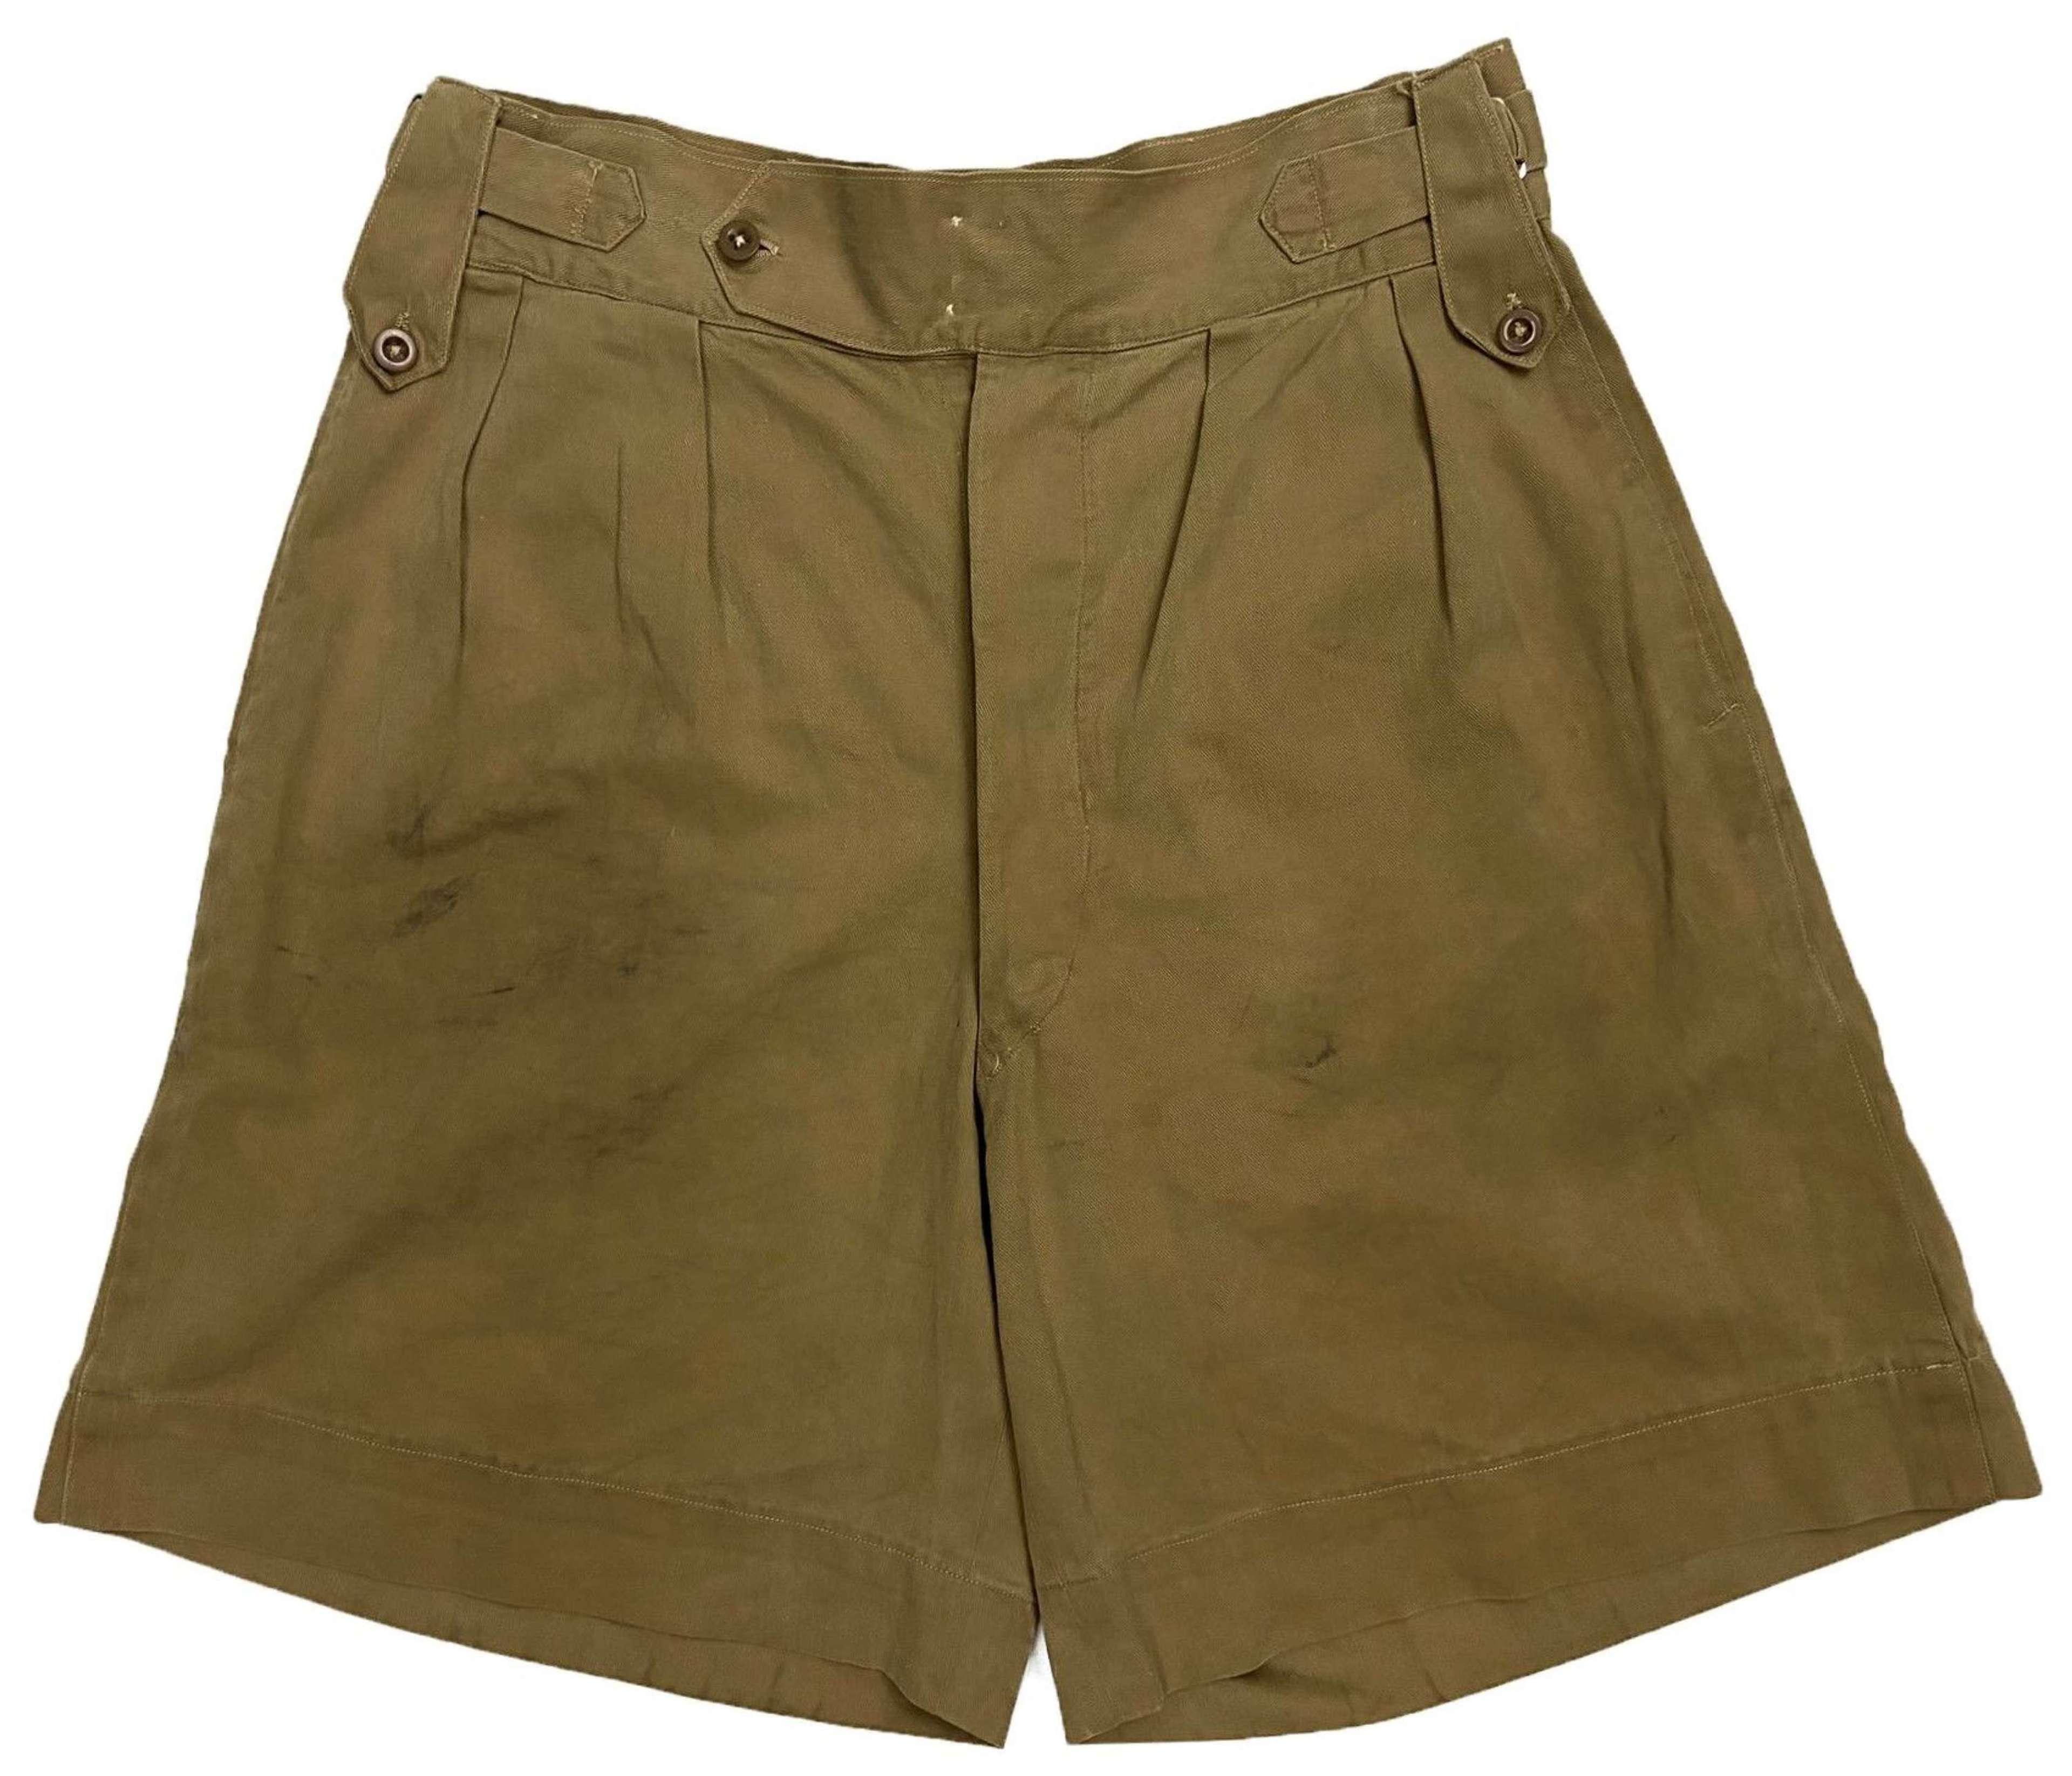 Original 1940s Theatre Made British Khaki Drill Shorts - Size 32